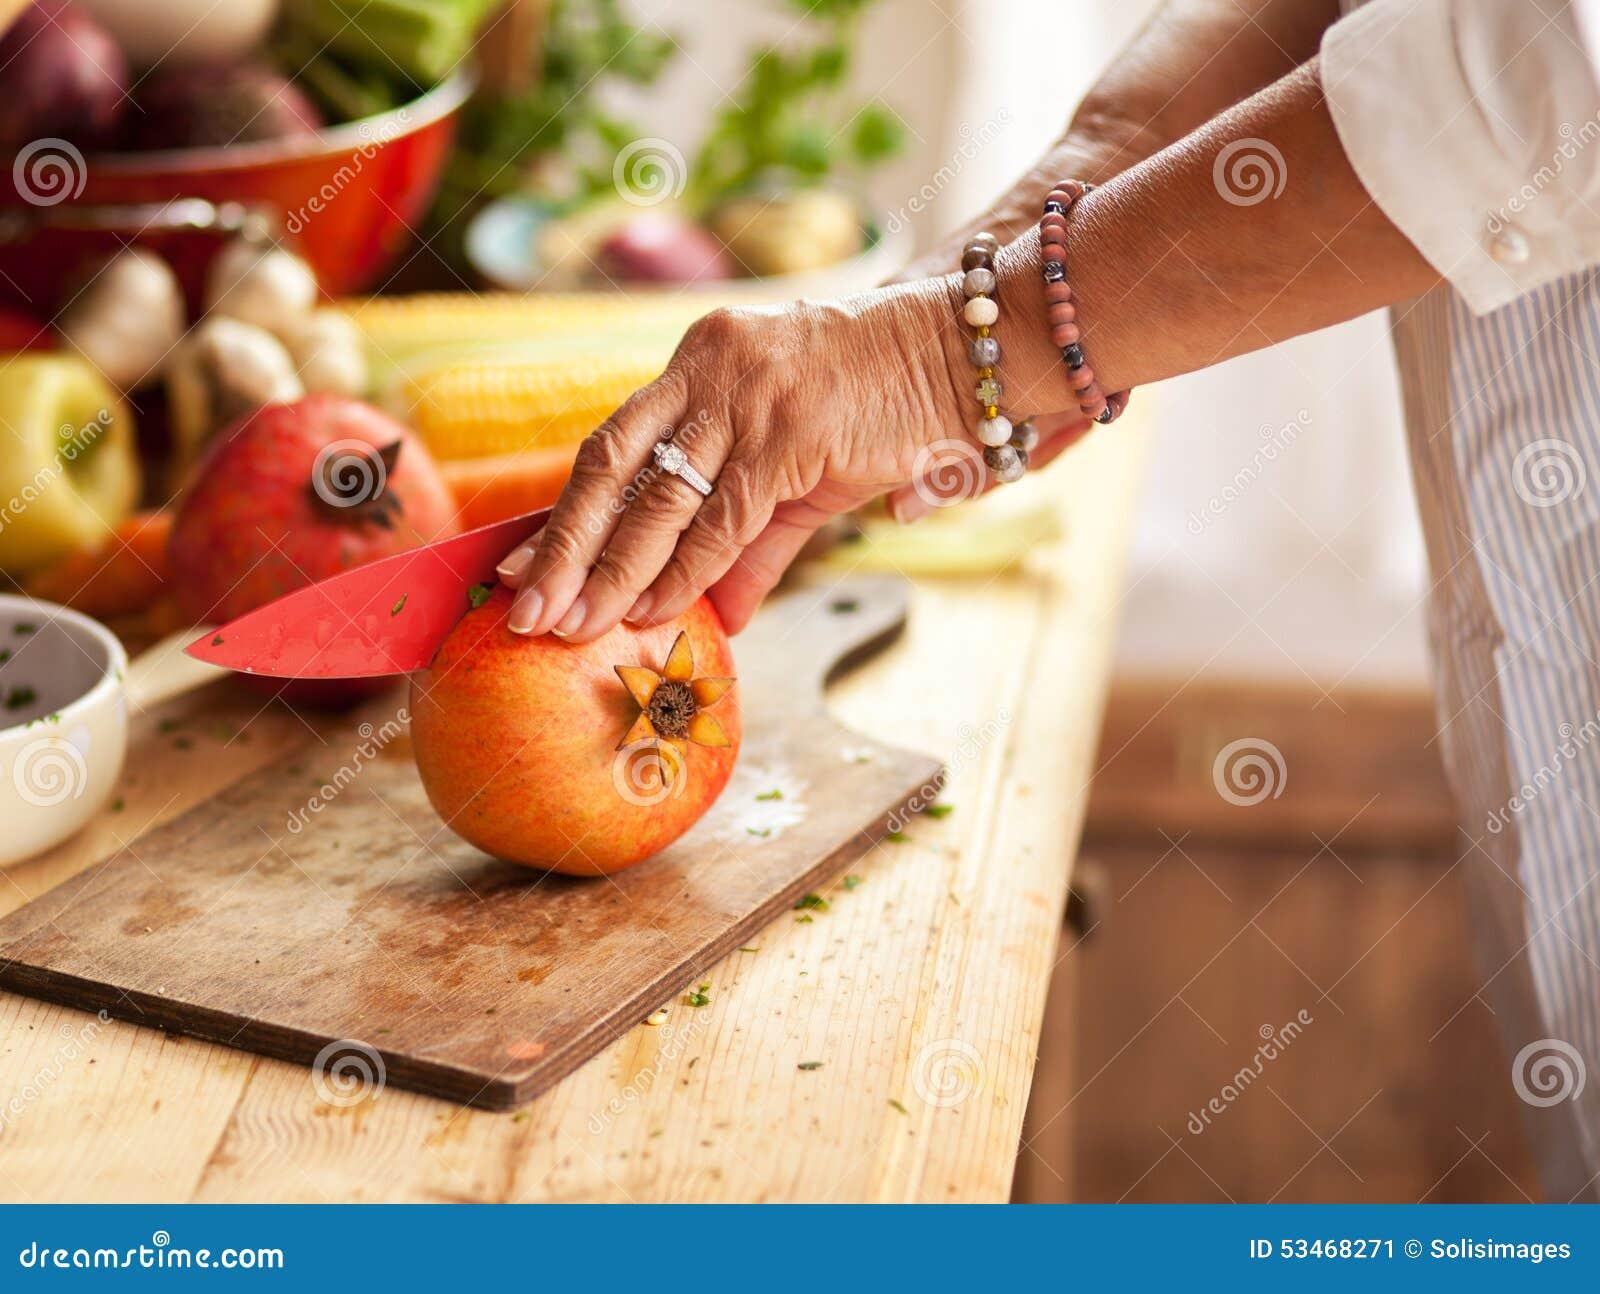 Senior woman preparing fruit salad